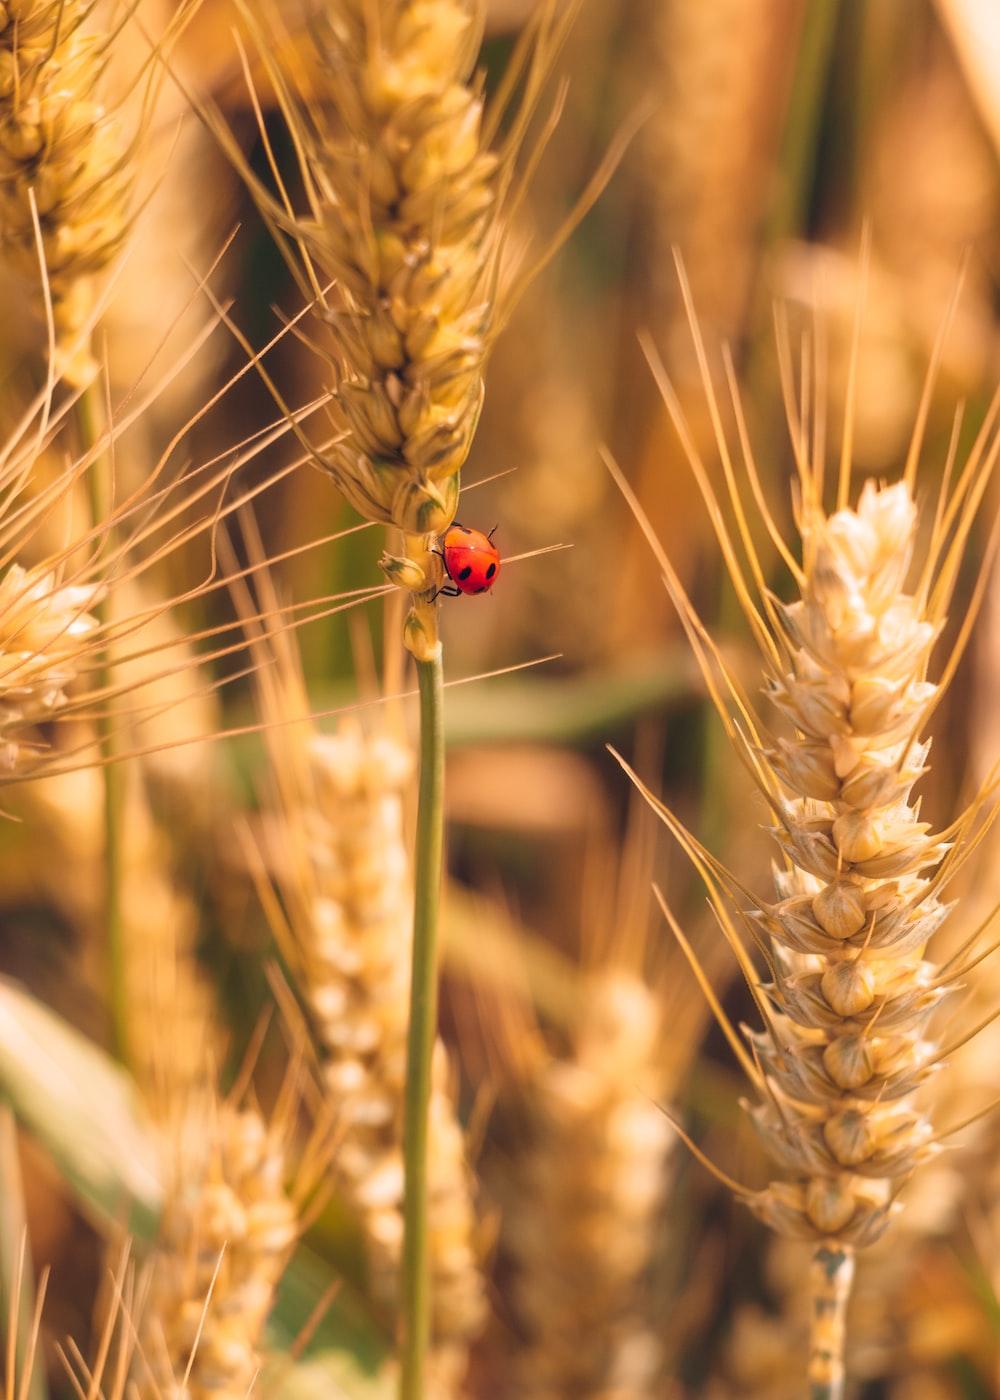 red ladybug on brown wheat during daytime